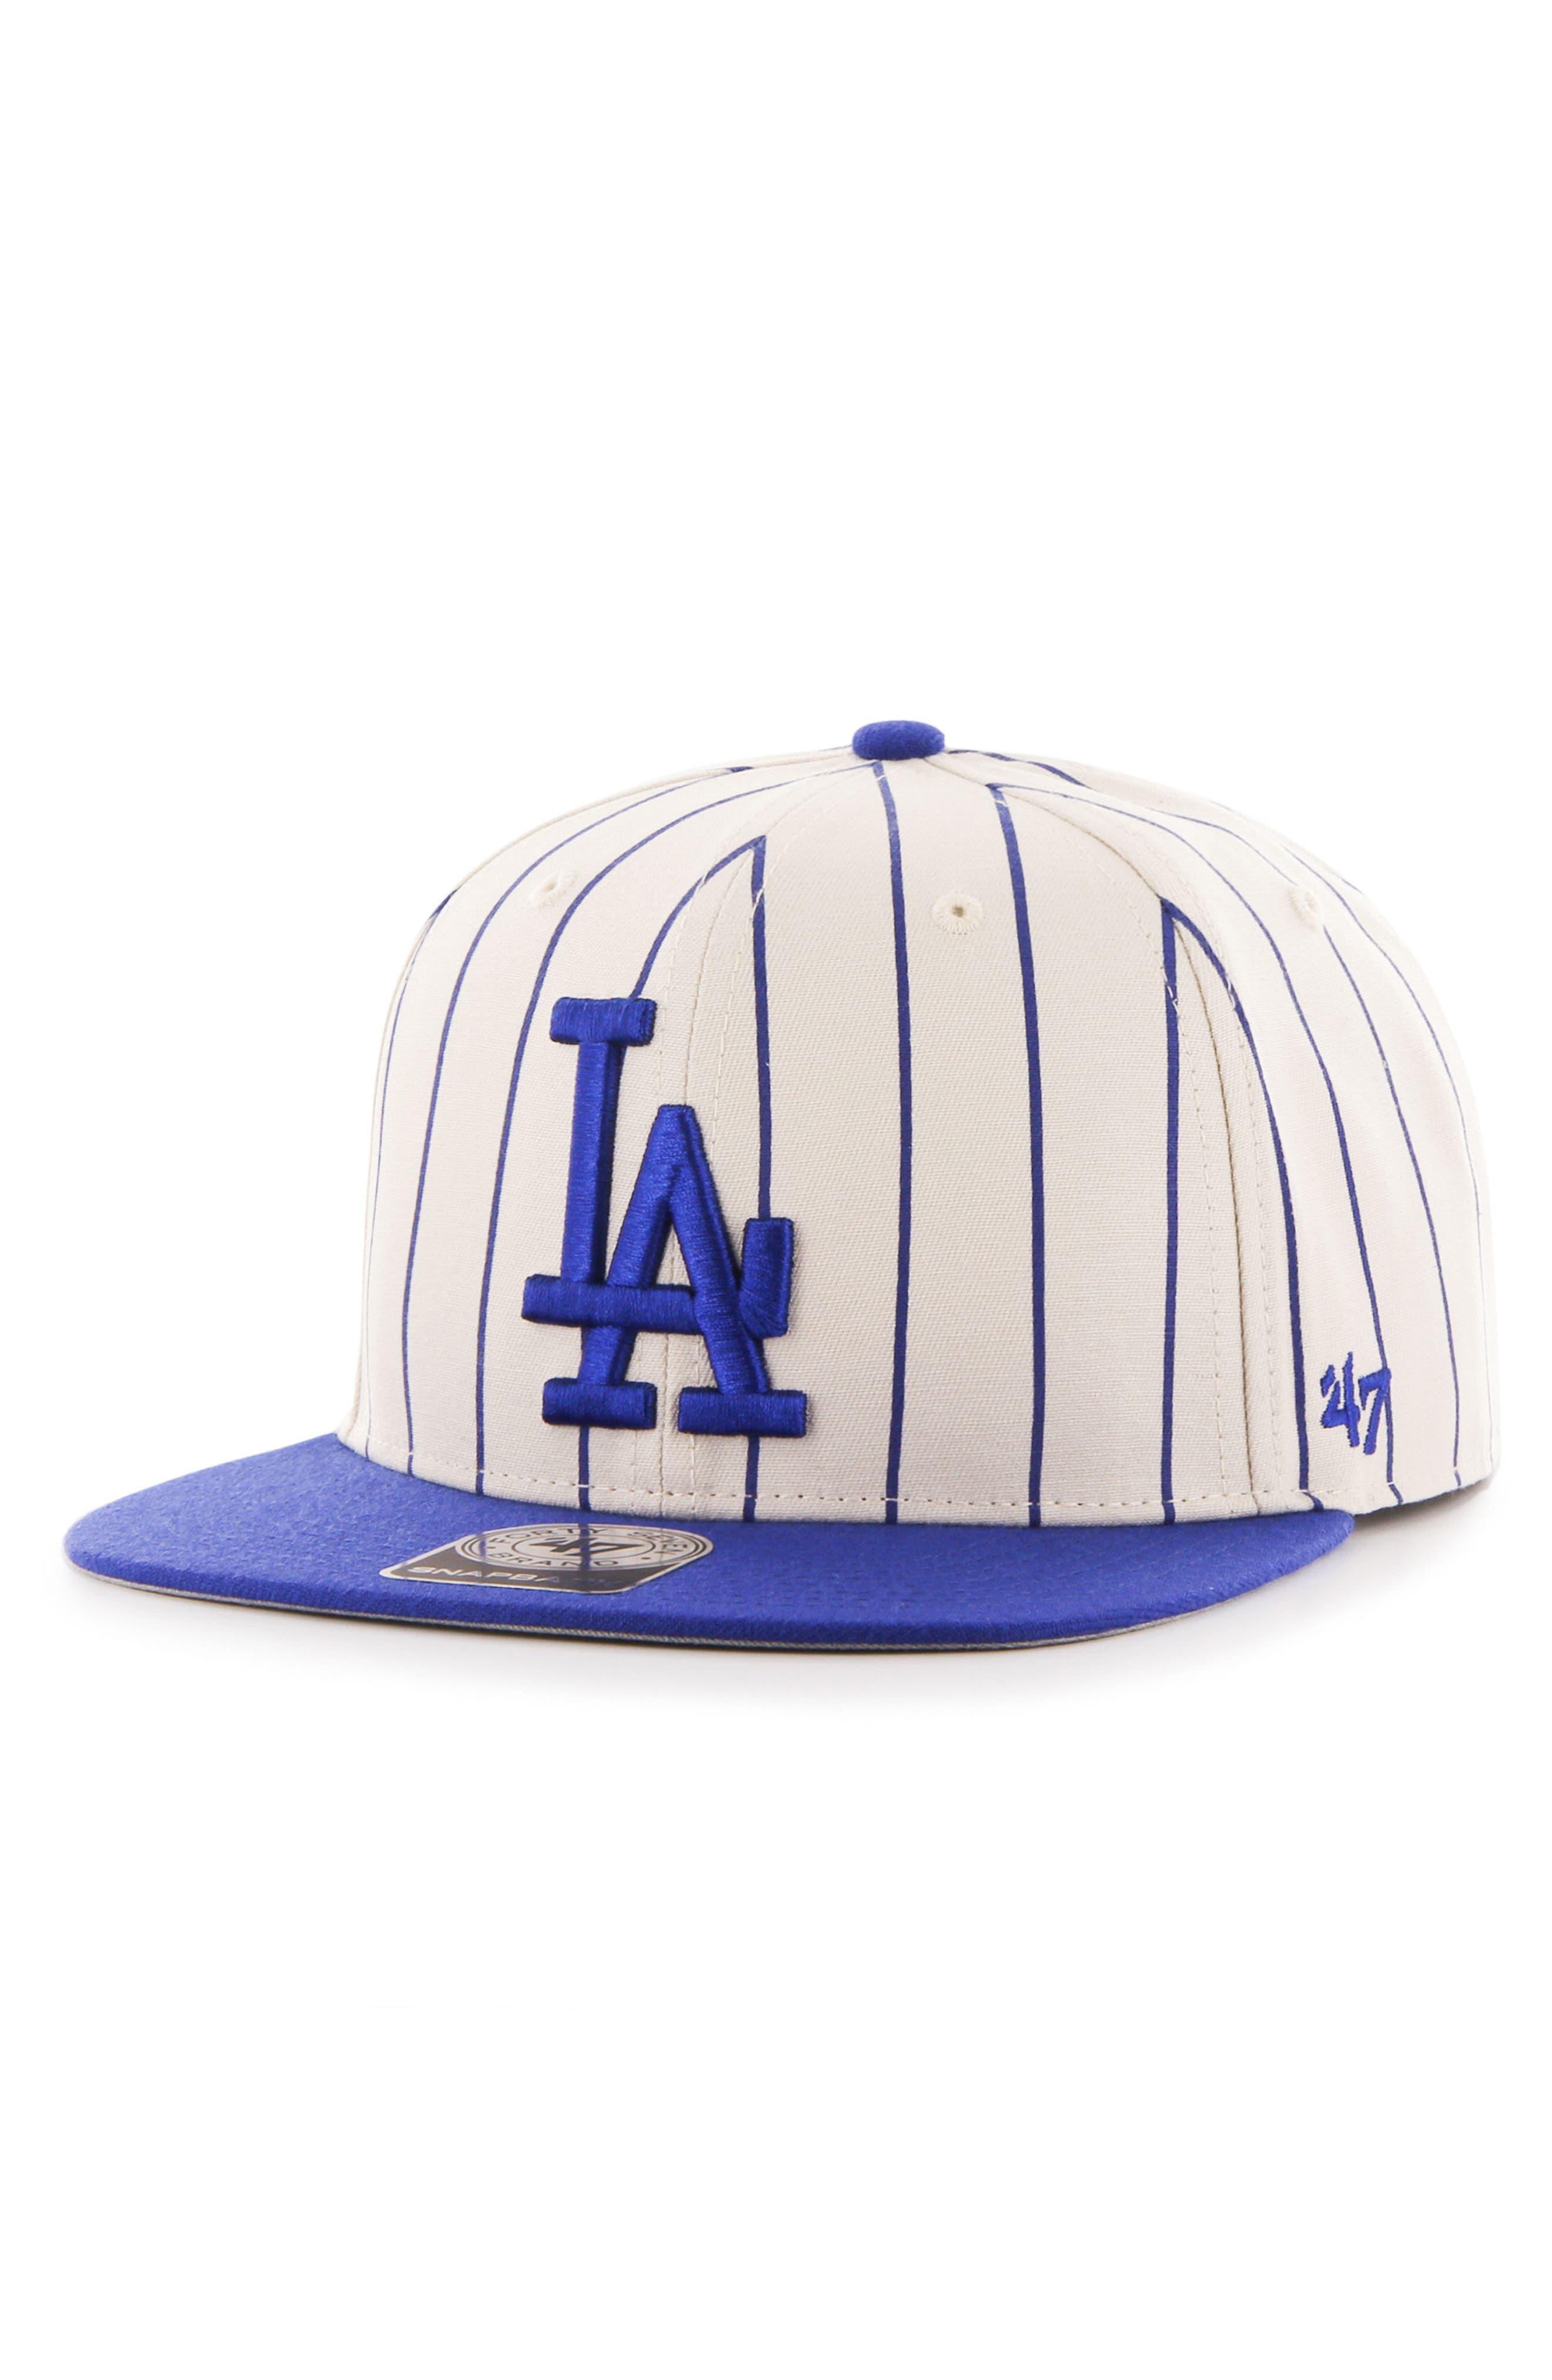 LA Dodgers Pinstripe Baseball Cap,                             Main thumbnail 1, color,                             Open White